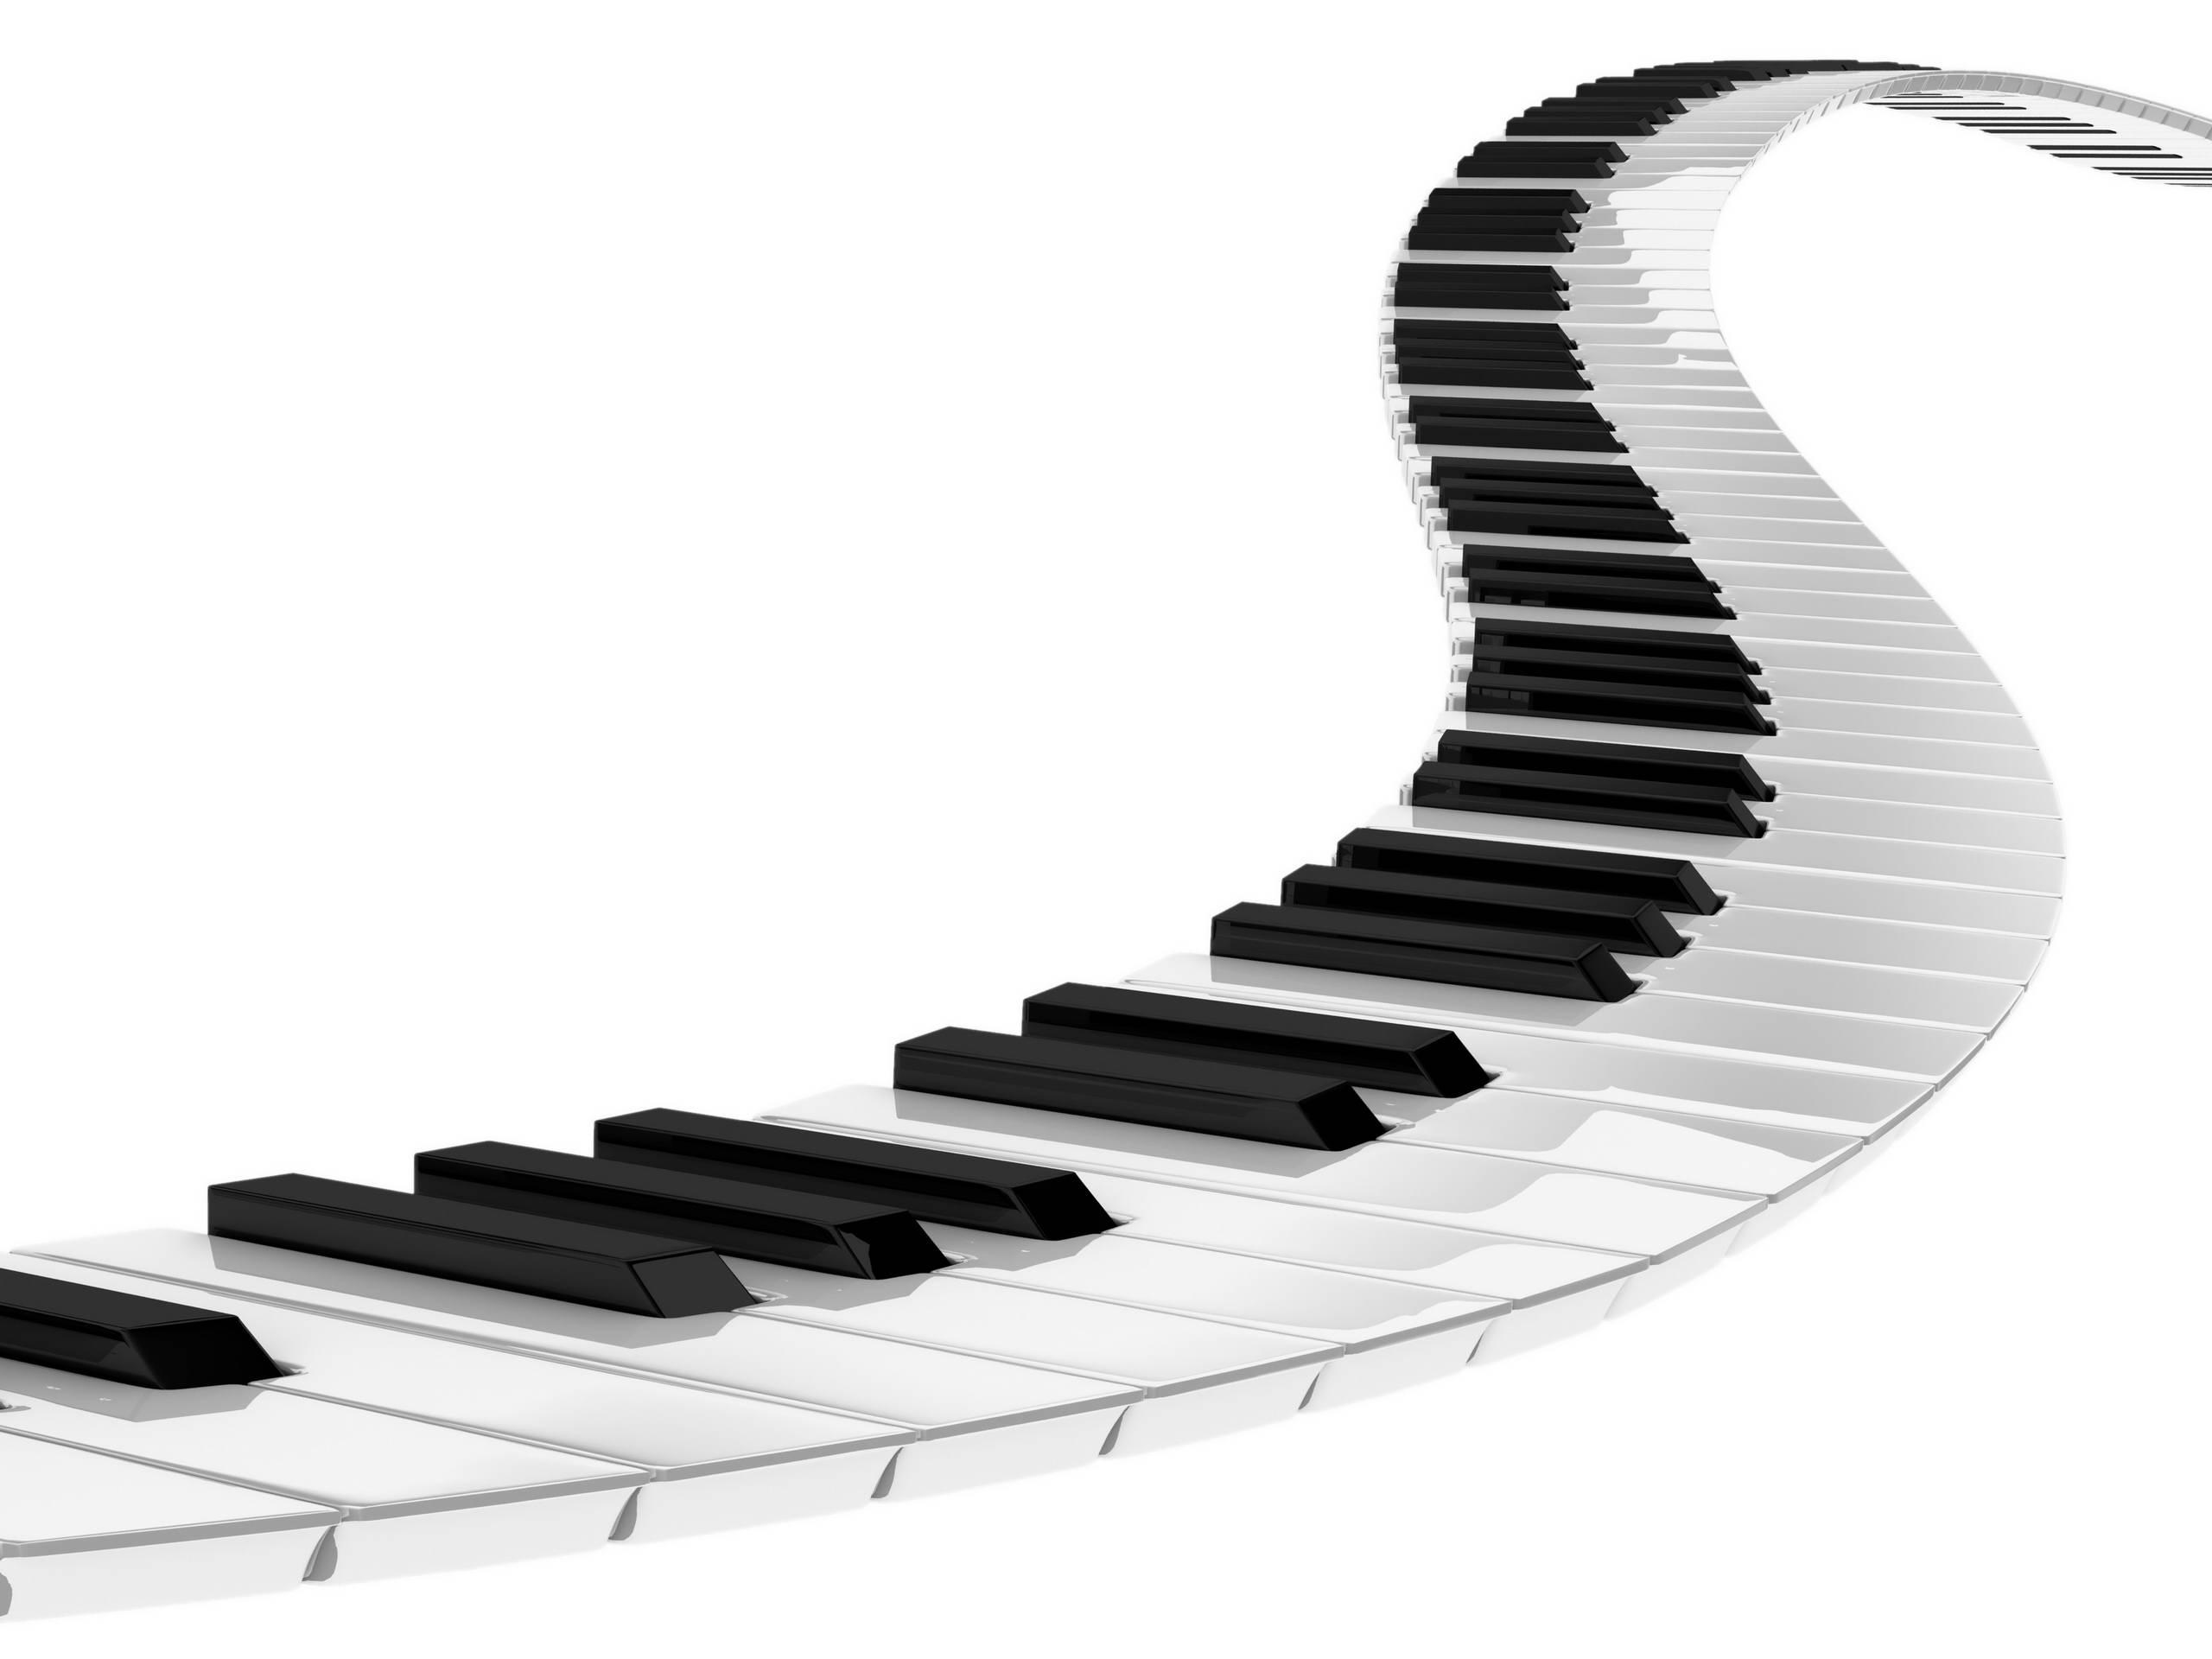 piano music notes wallpaper 8736 hd wallpapers